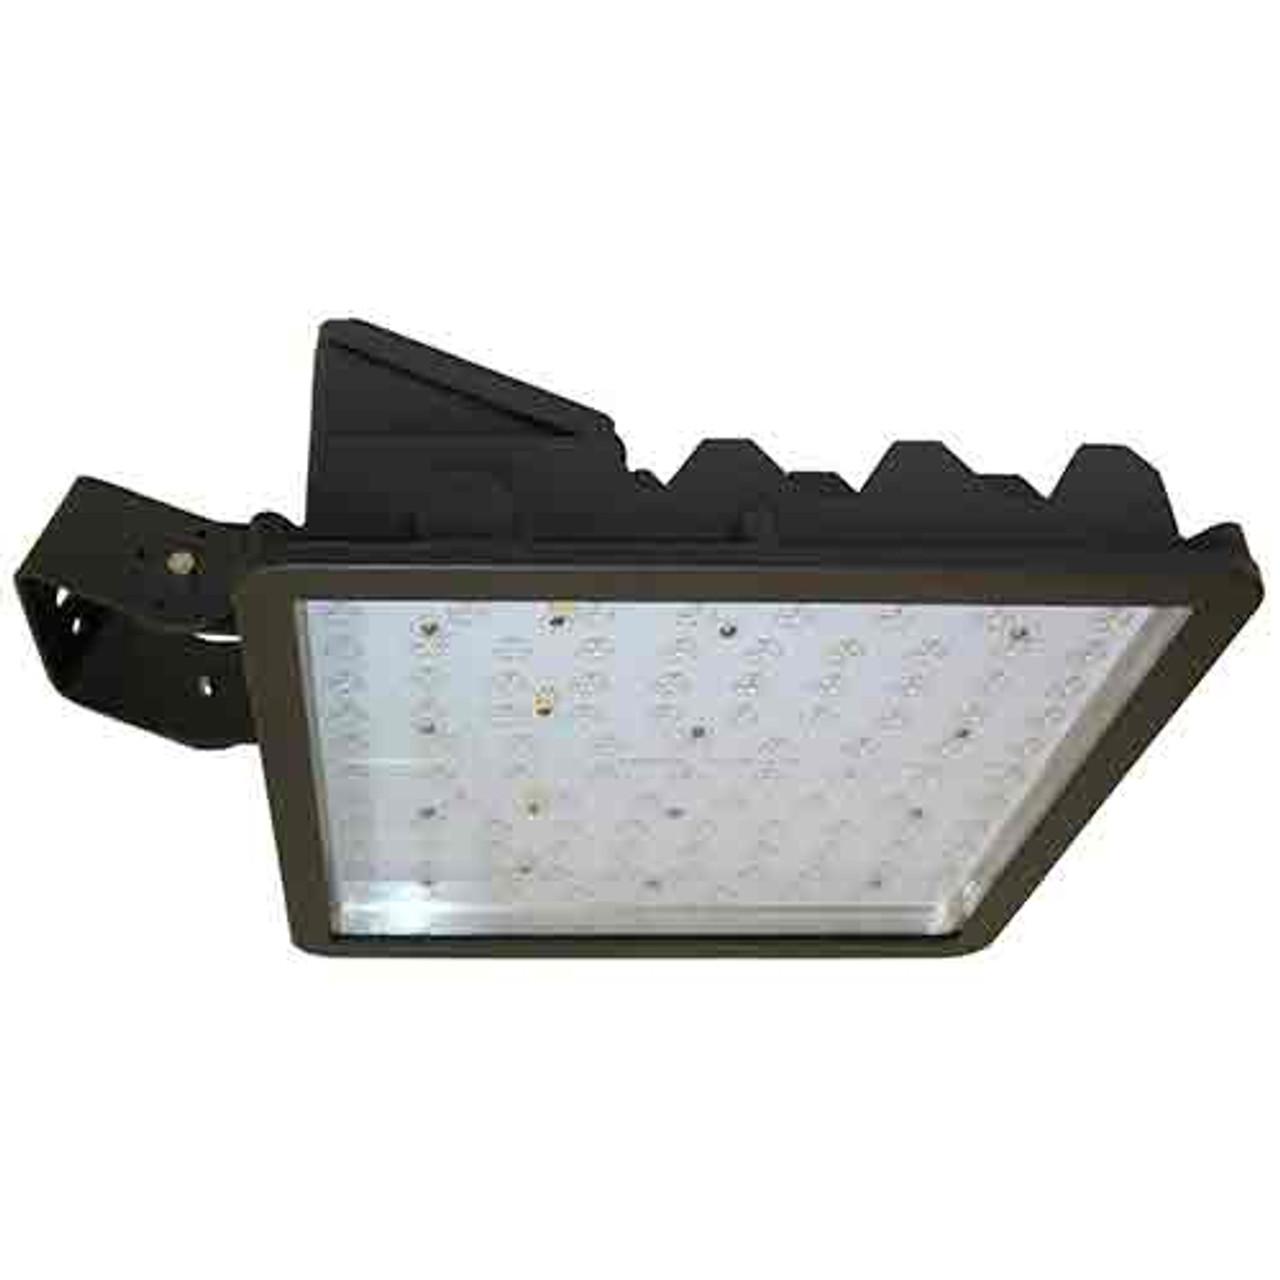 175 Watt LED Area Light 16,964 Lumens with Bracket Mount